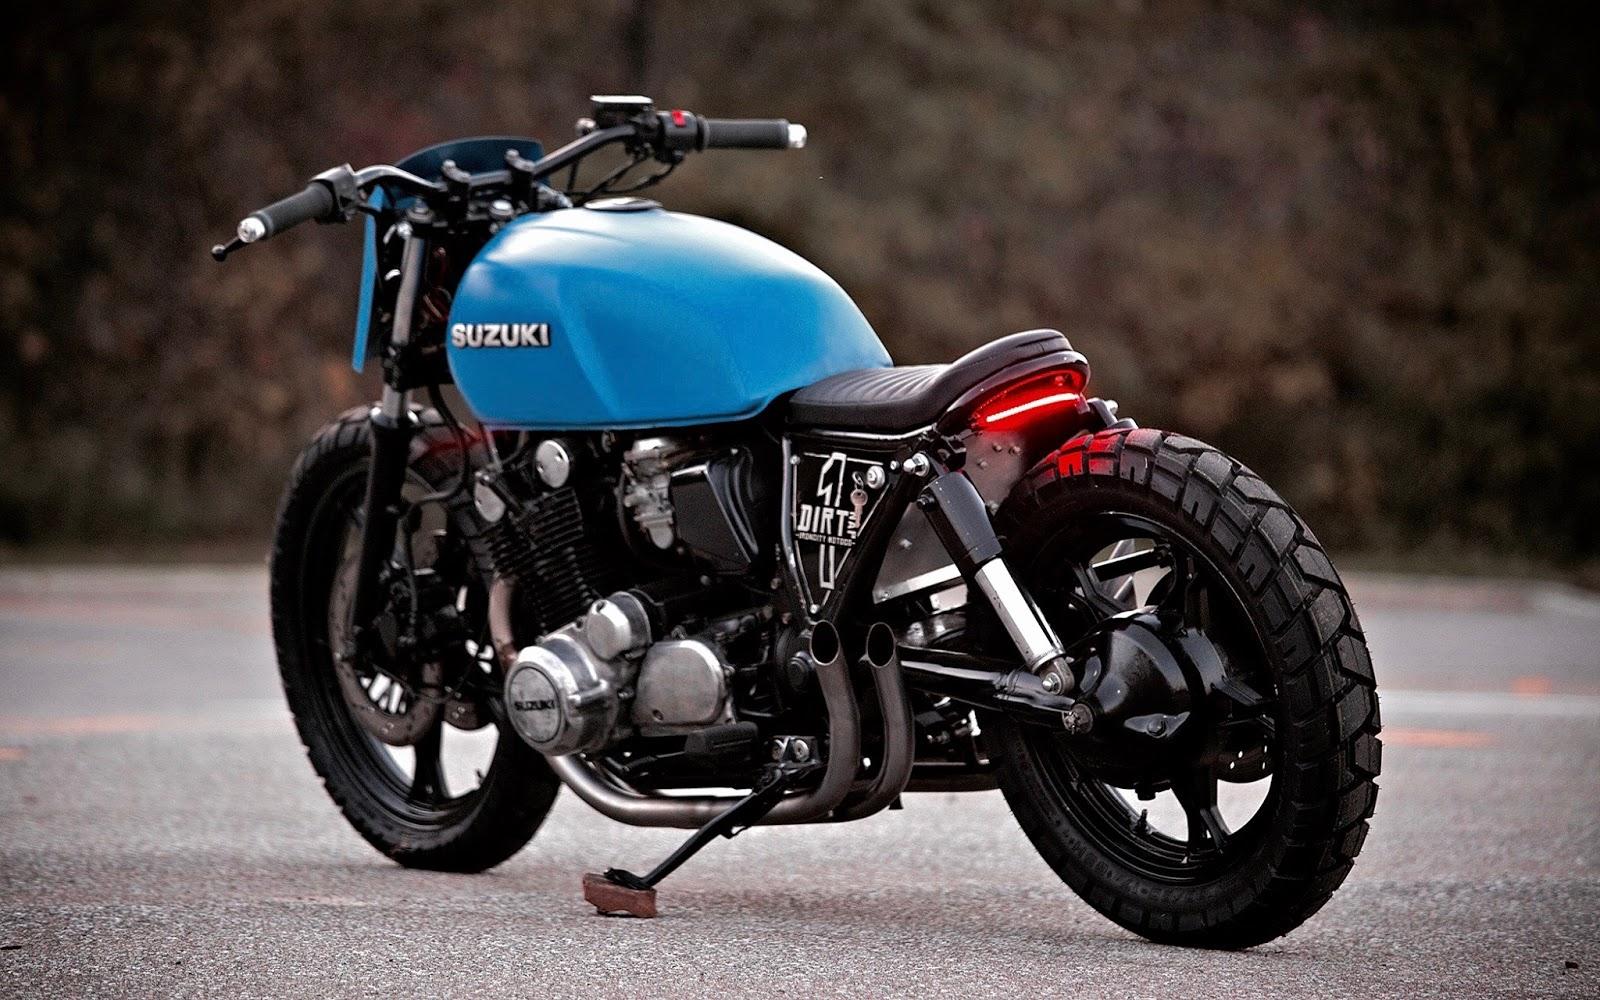 The Iron City Rider Inazuma Caf 233 Racer